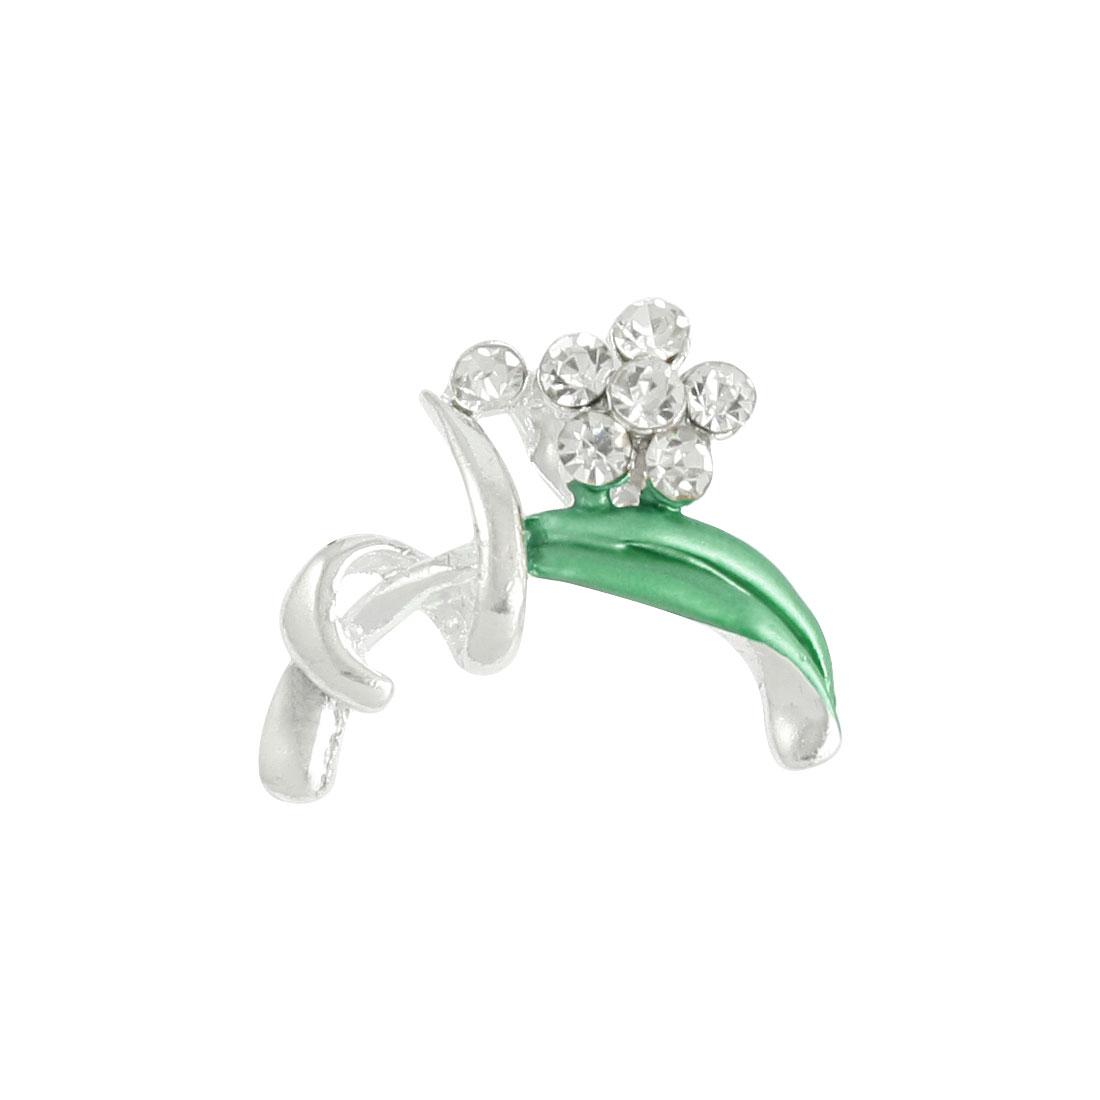 Silver Tone Green Floral Rhinestone Inlaid Pin Brooch Breastpin Ornament